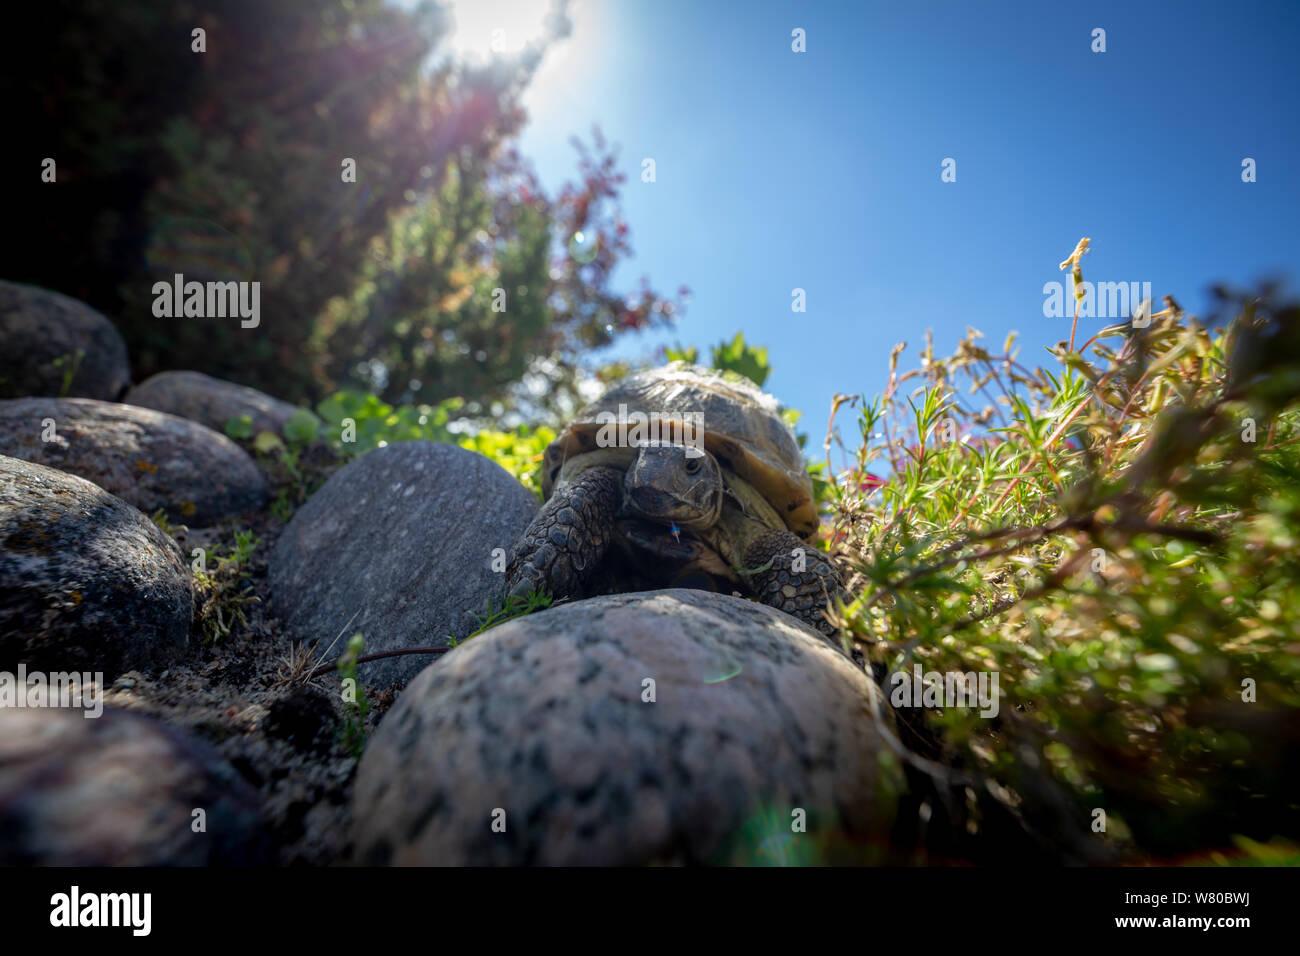 Russian tortoise exploring Stock Photo